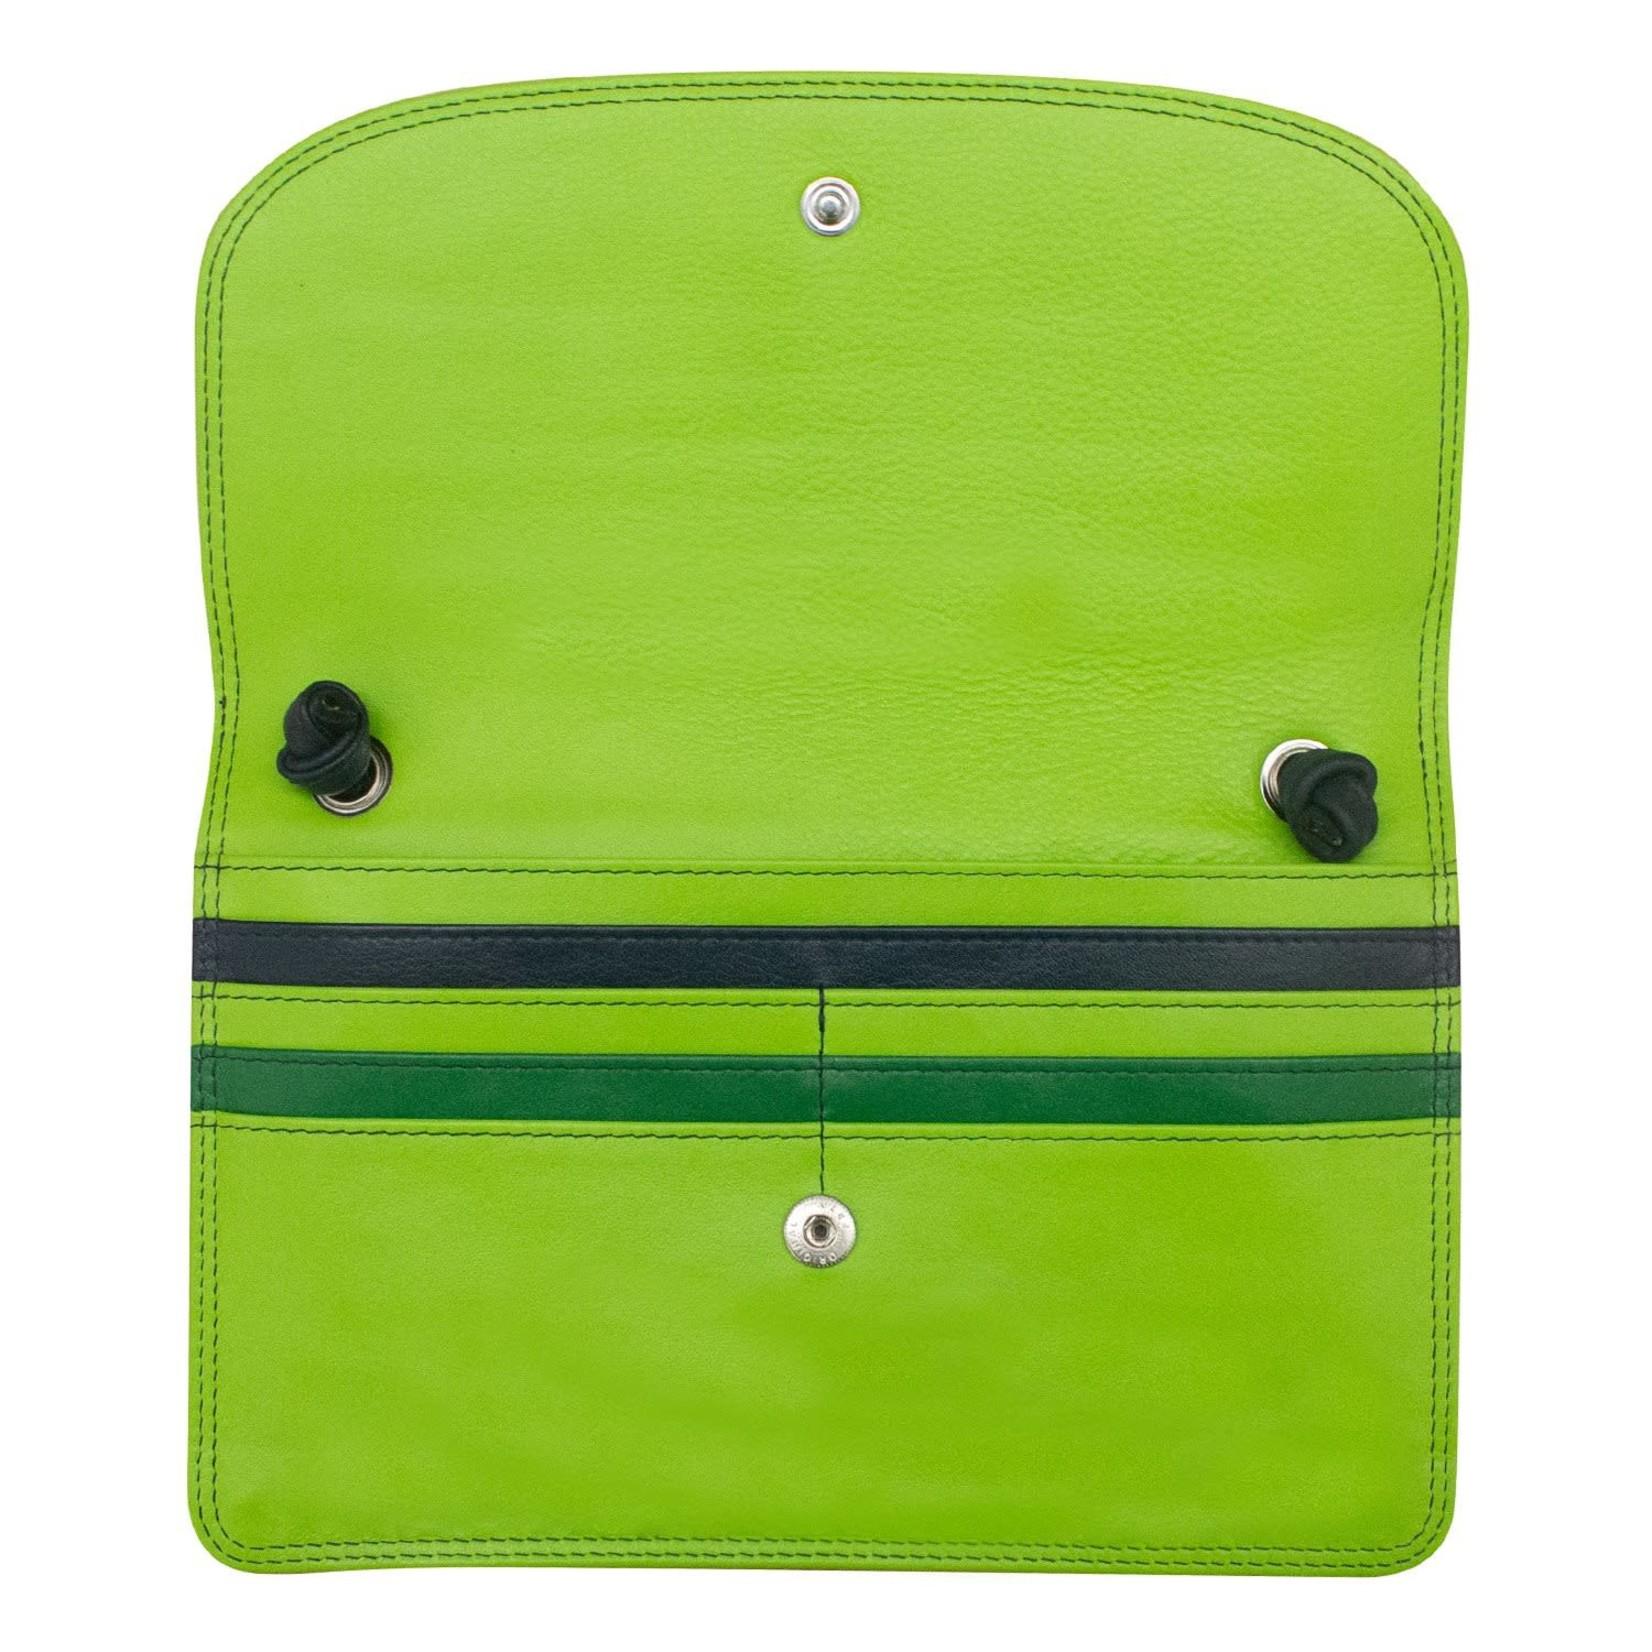 Leather Handbags and Accessories 6181 Meadow - RFID Slim Crossbody Wallet